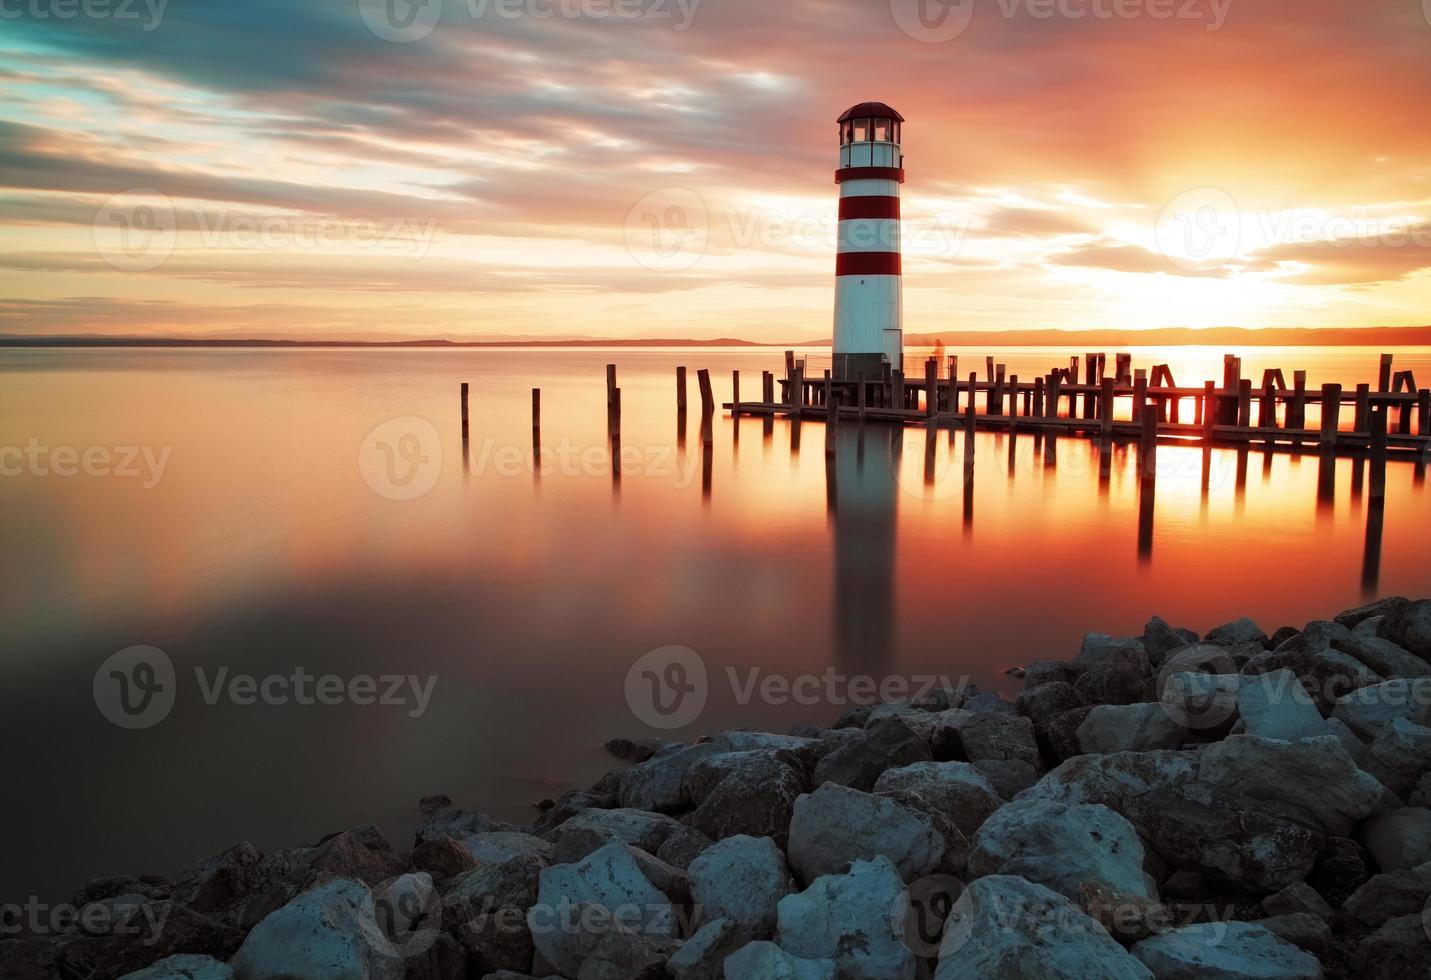 Landscape ocean sunset - lighthouse photo